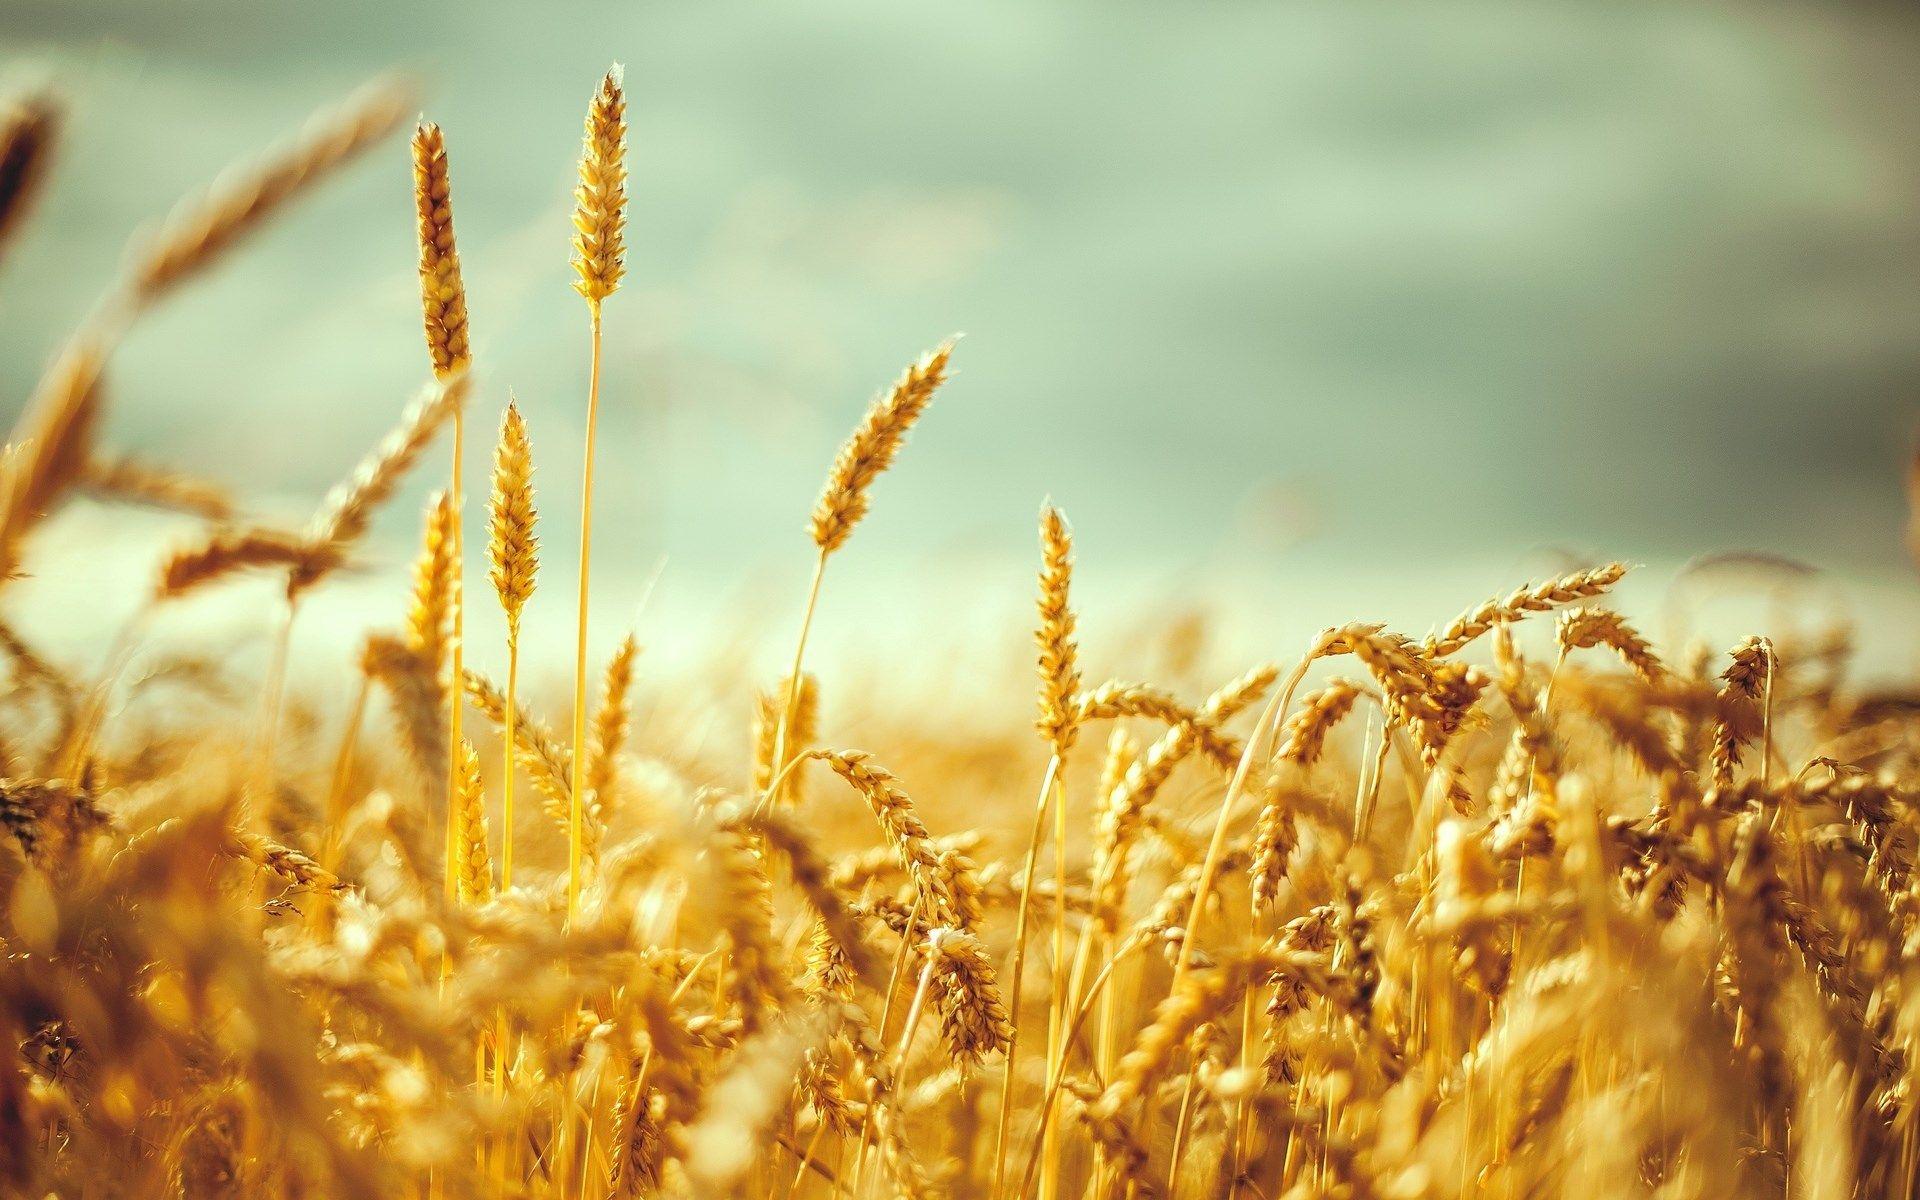 Wheat Wave Analysis – 29 May, 2019